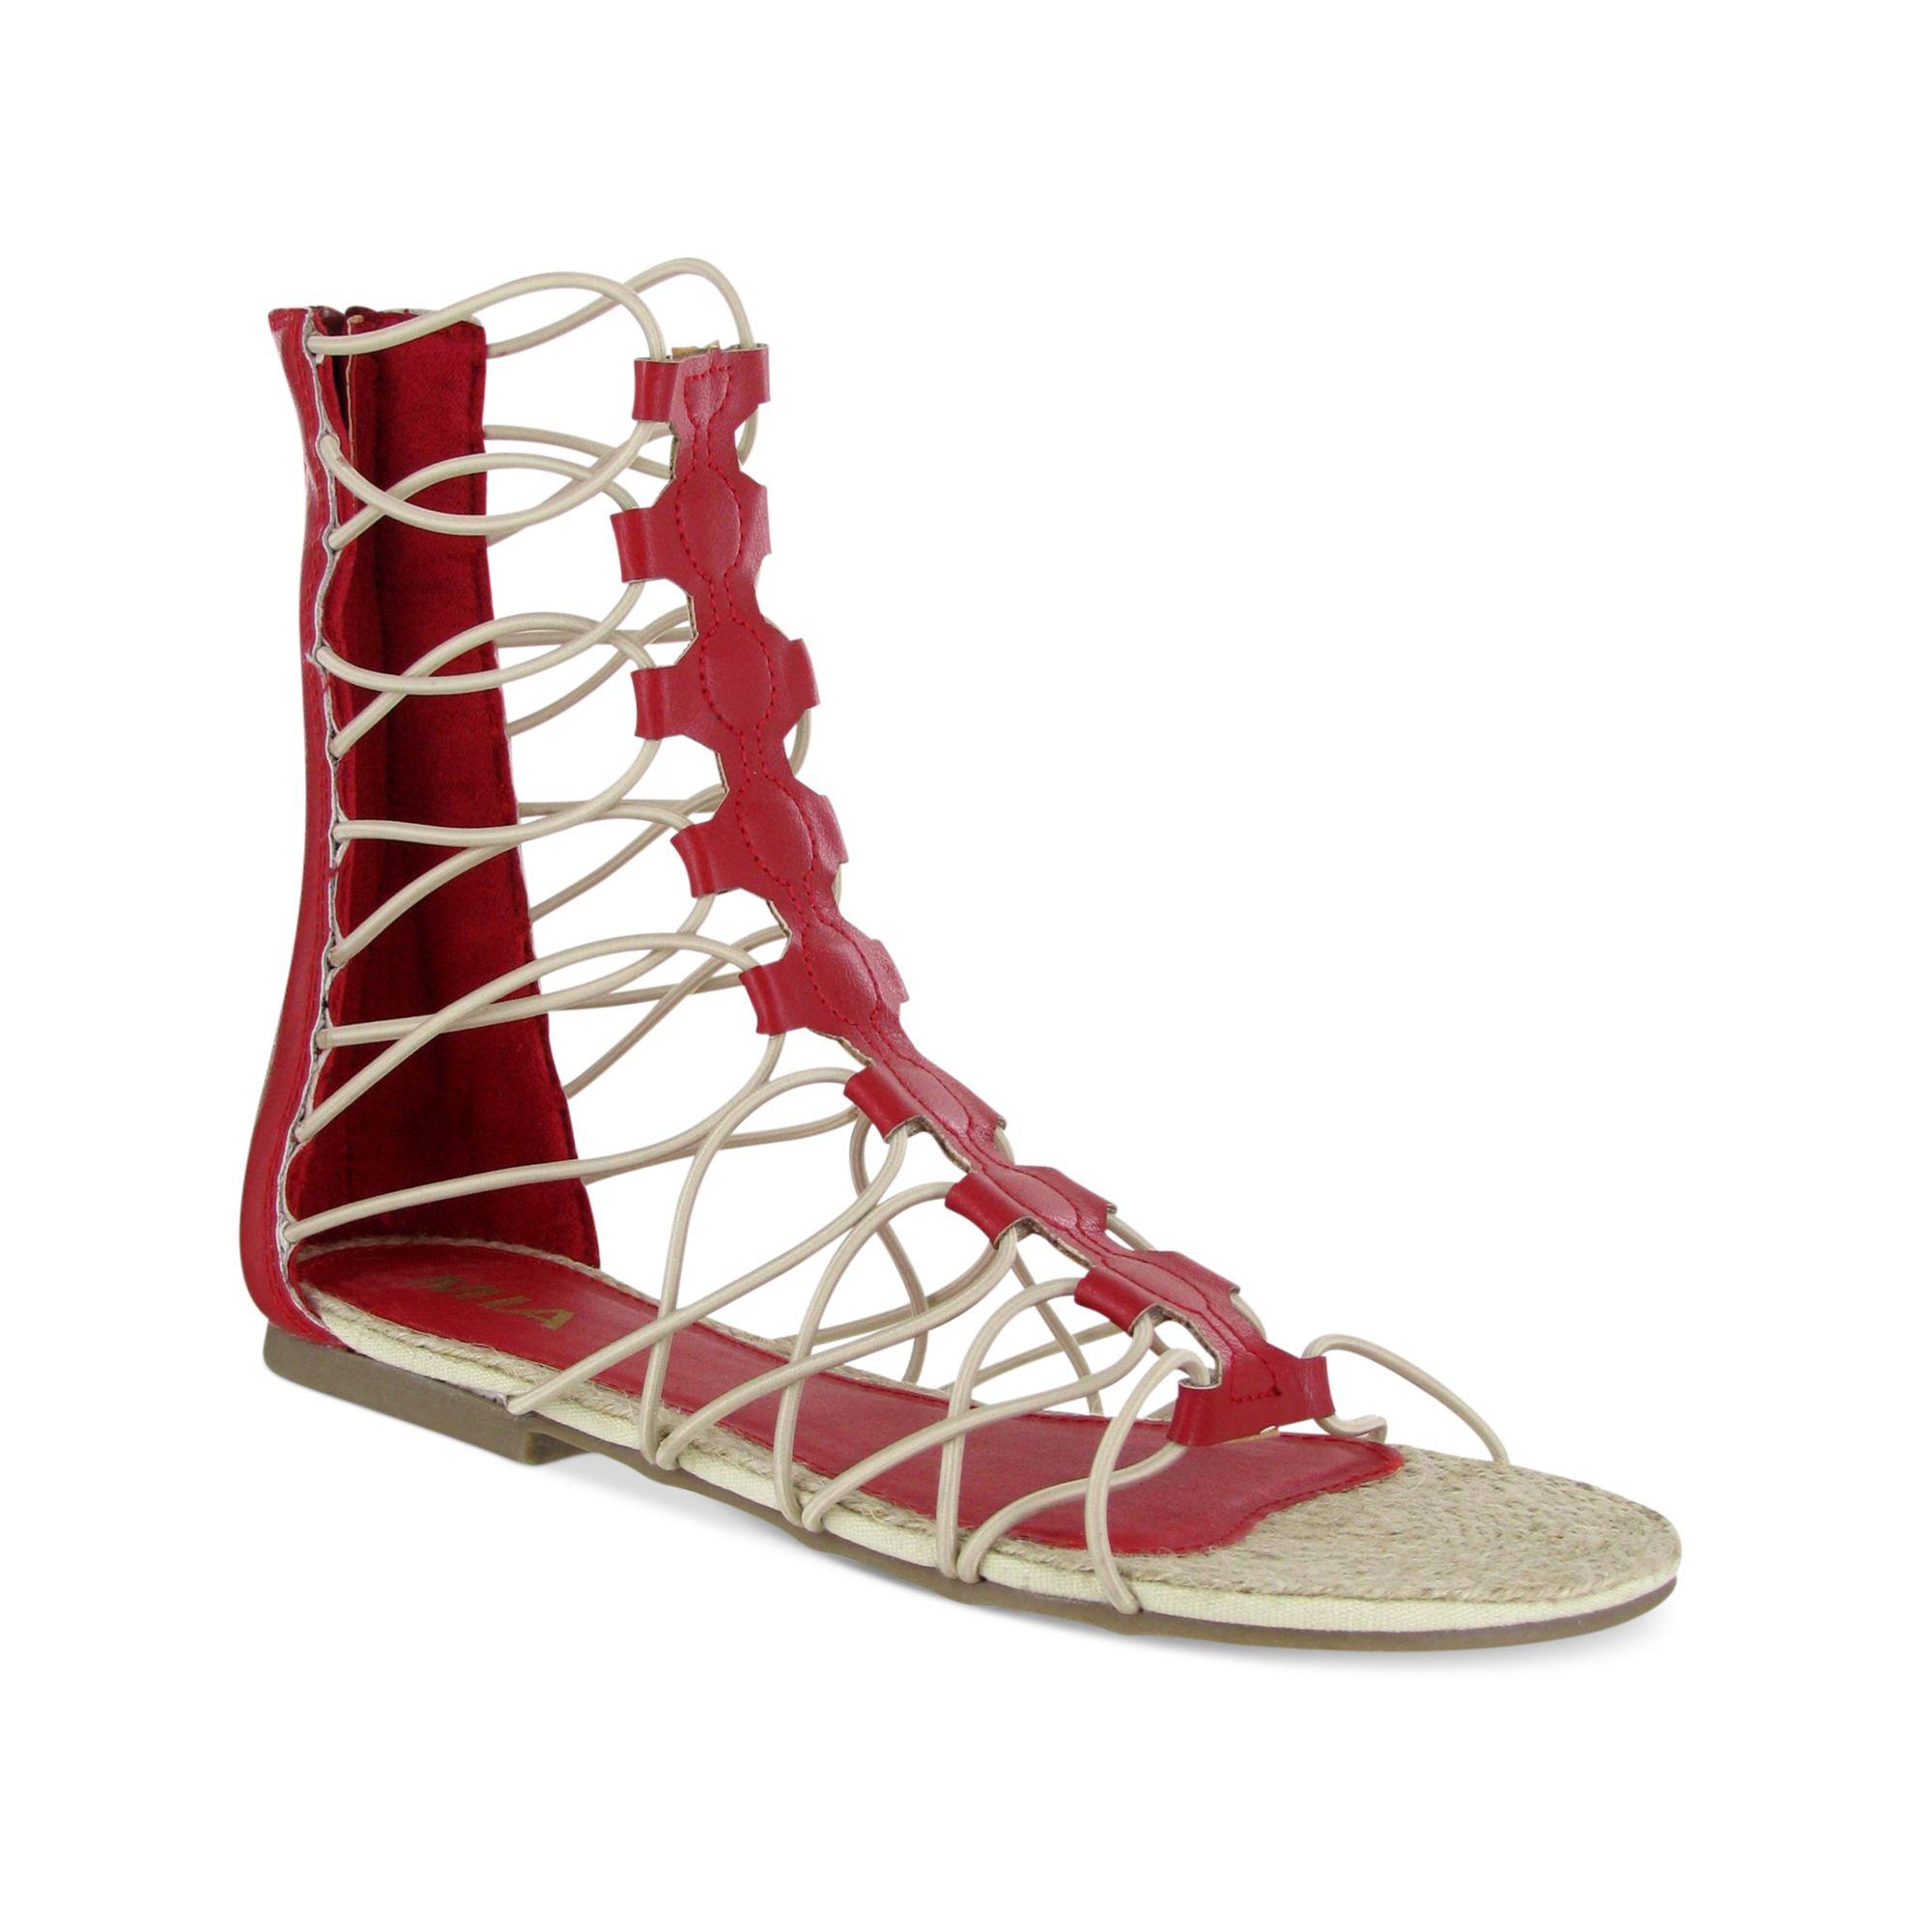 Mia Livi Gladiator Sandals In Red Lyst